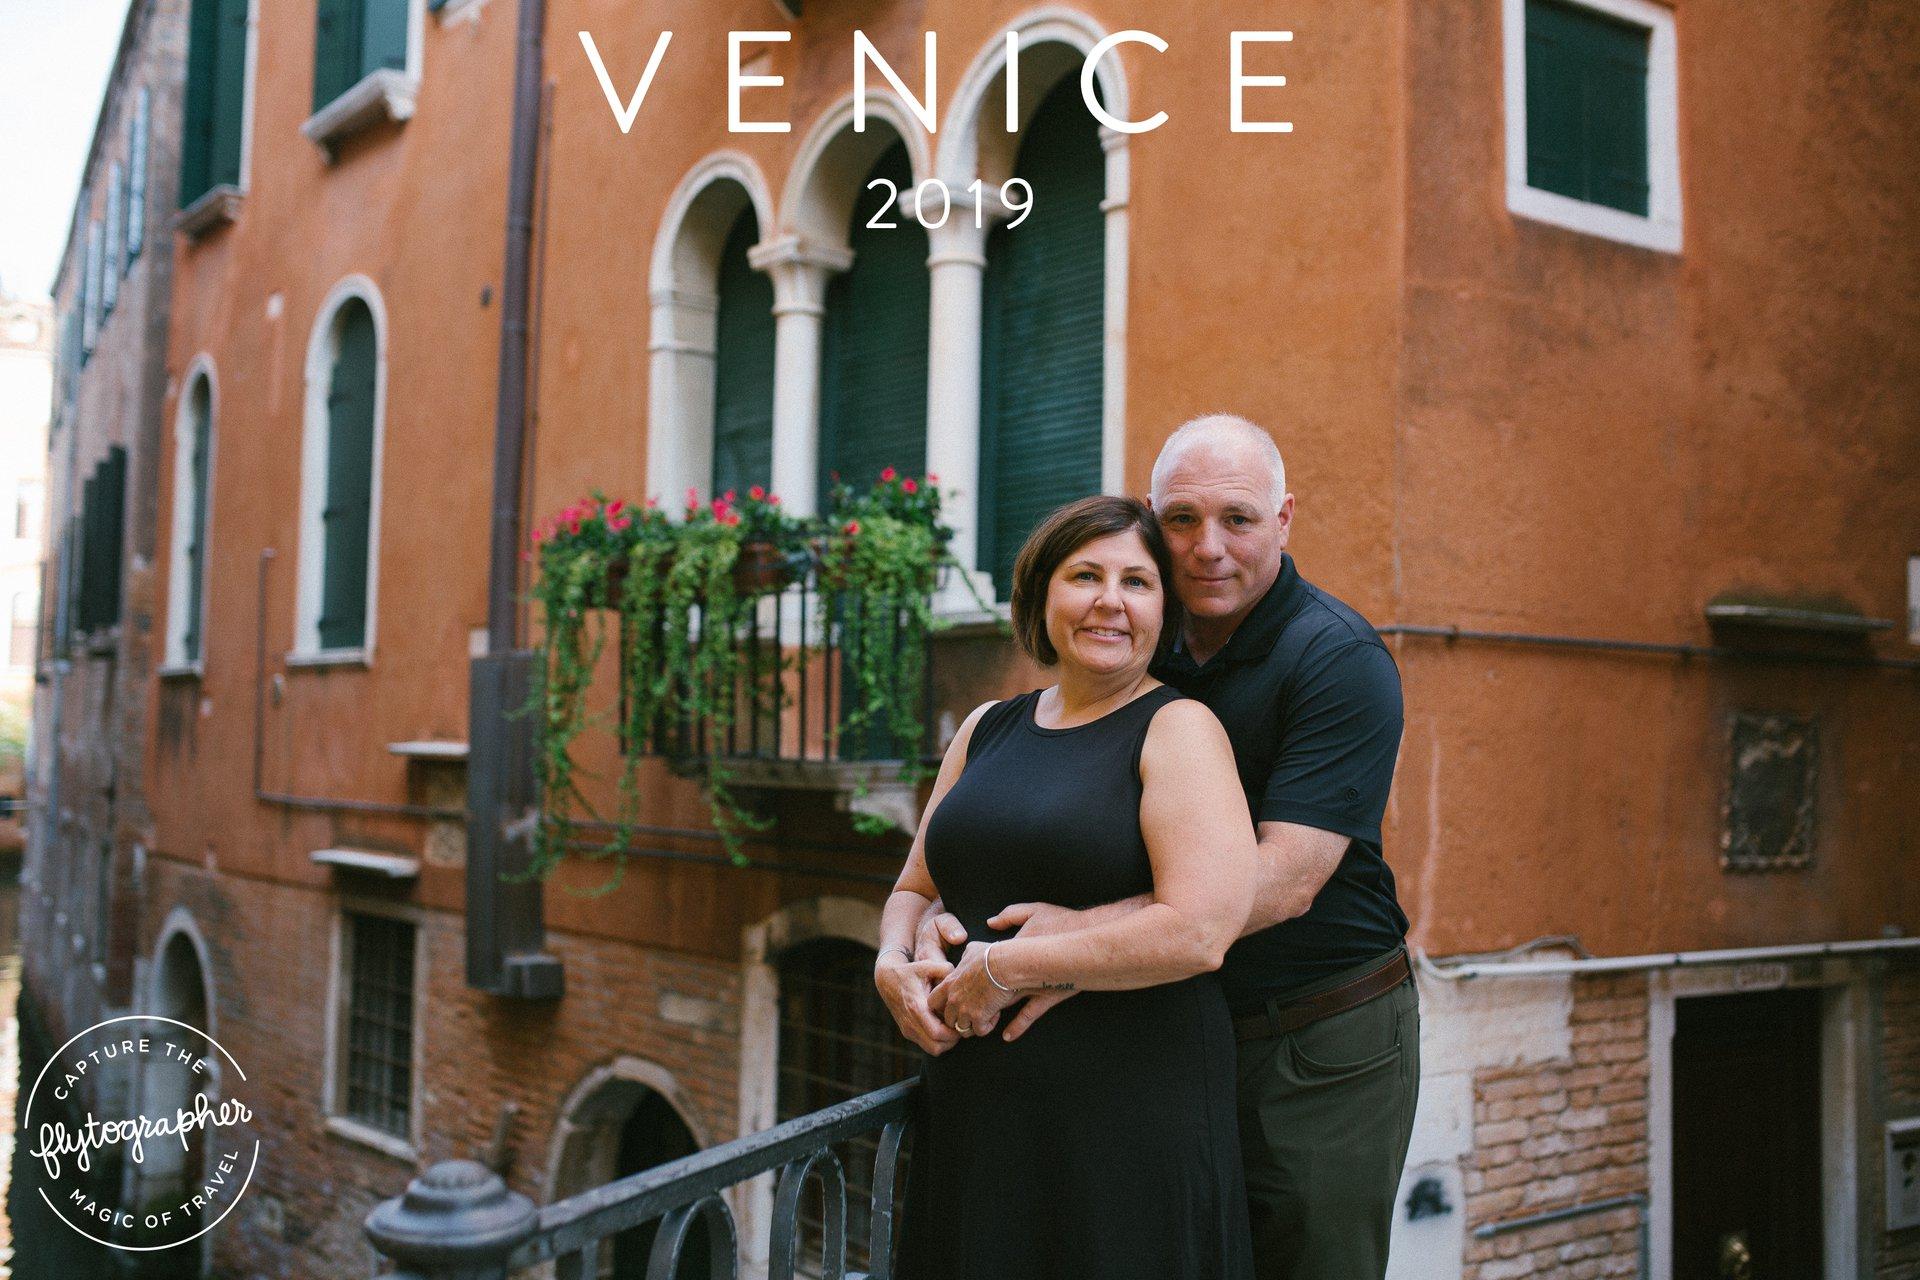 Venice-Italy-travel-story-Flytographer-32